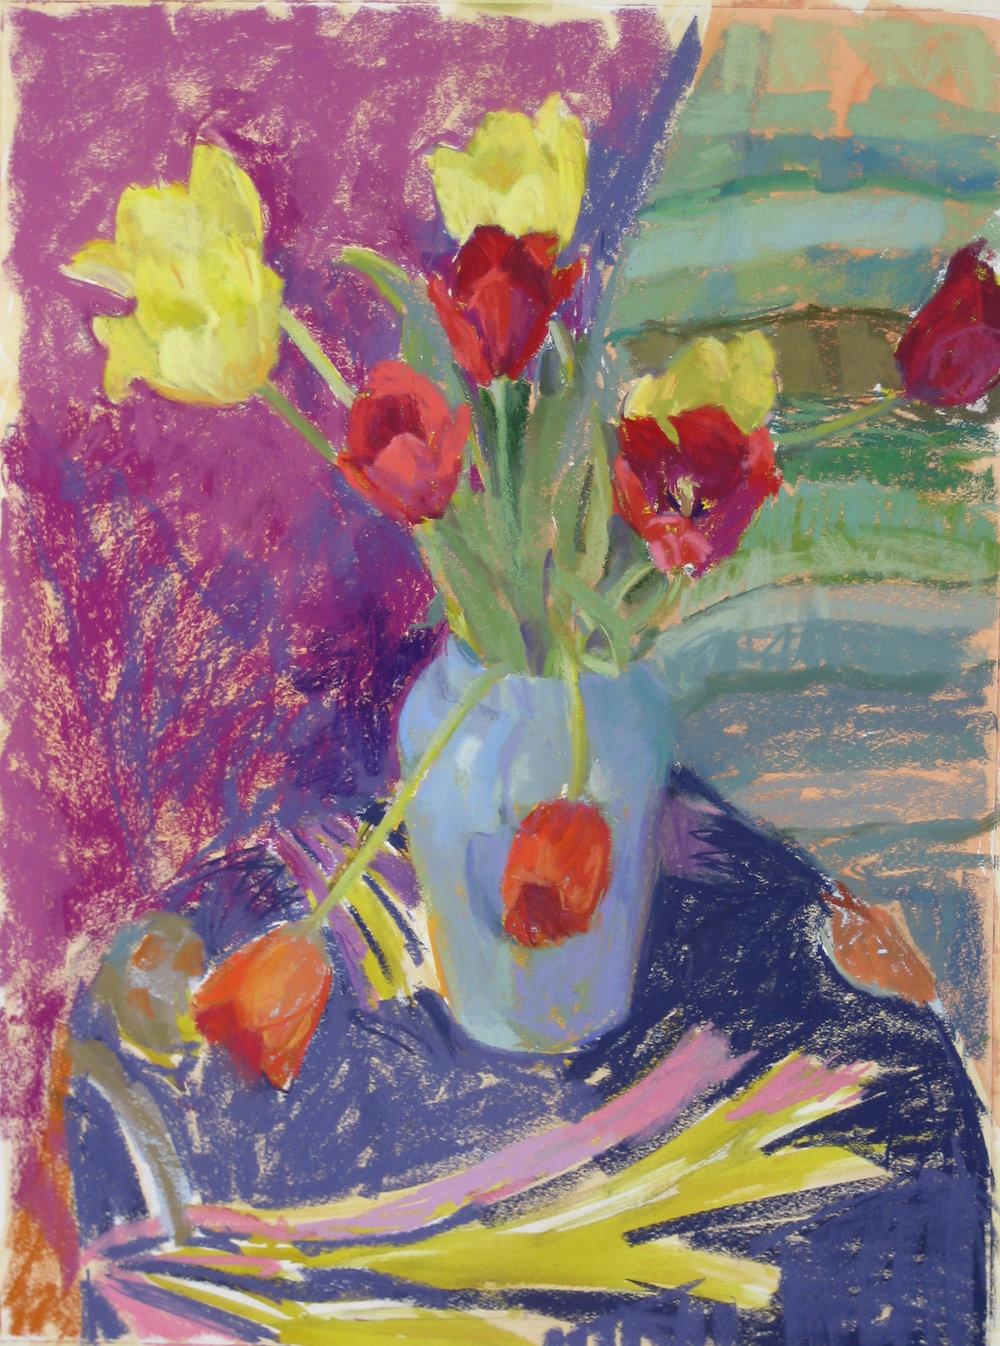 Tulips. February